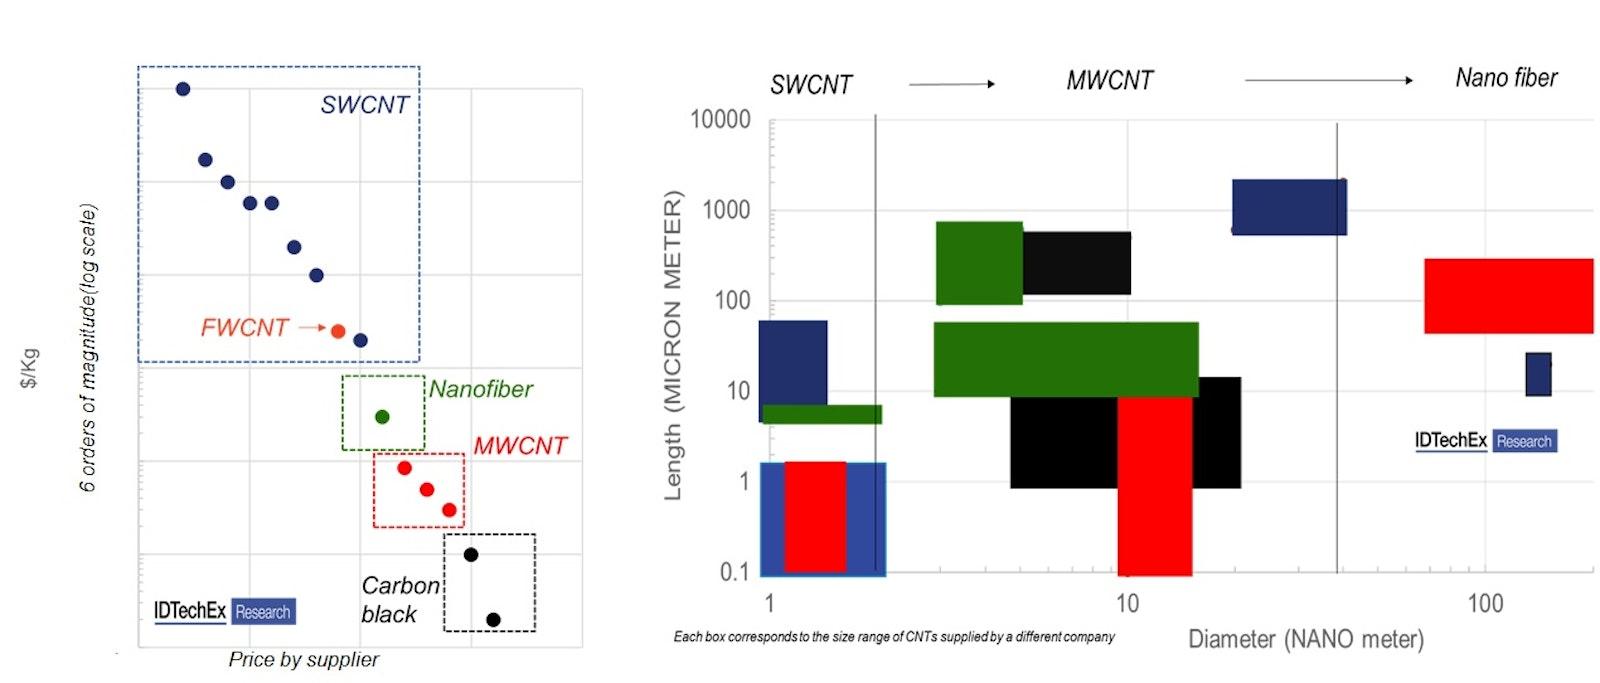 Carbon nanotube (CNT) commercialization: past, present and